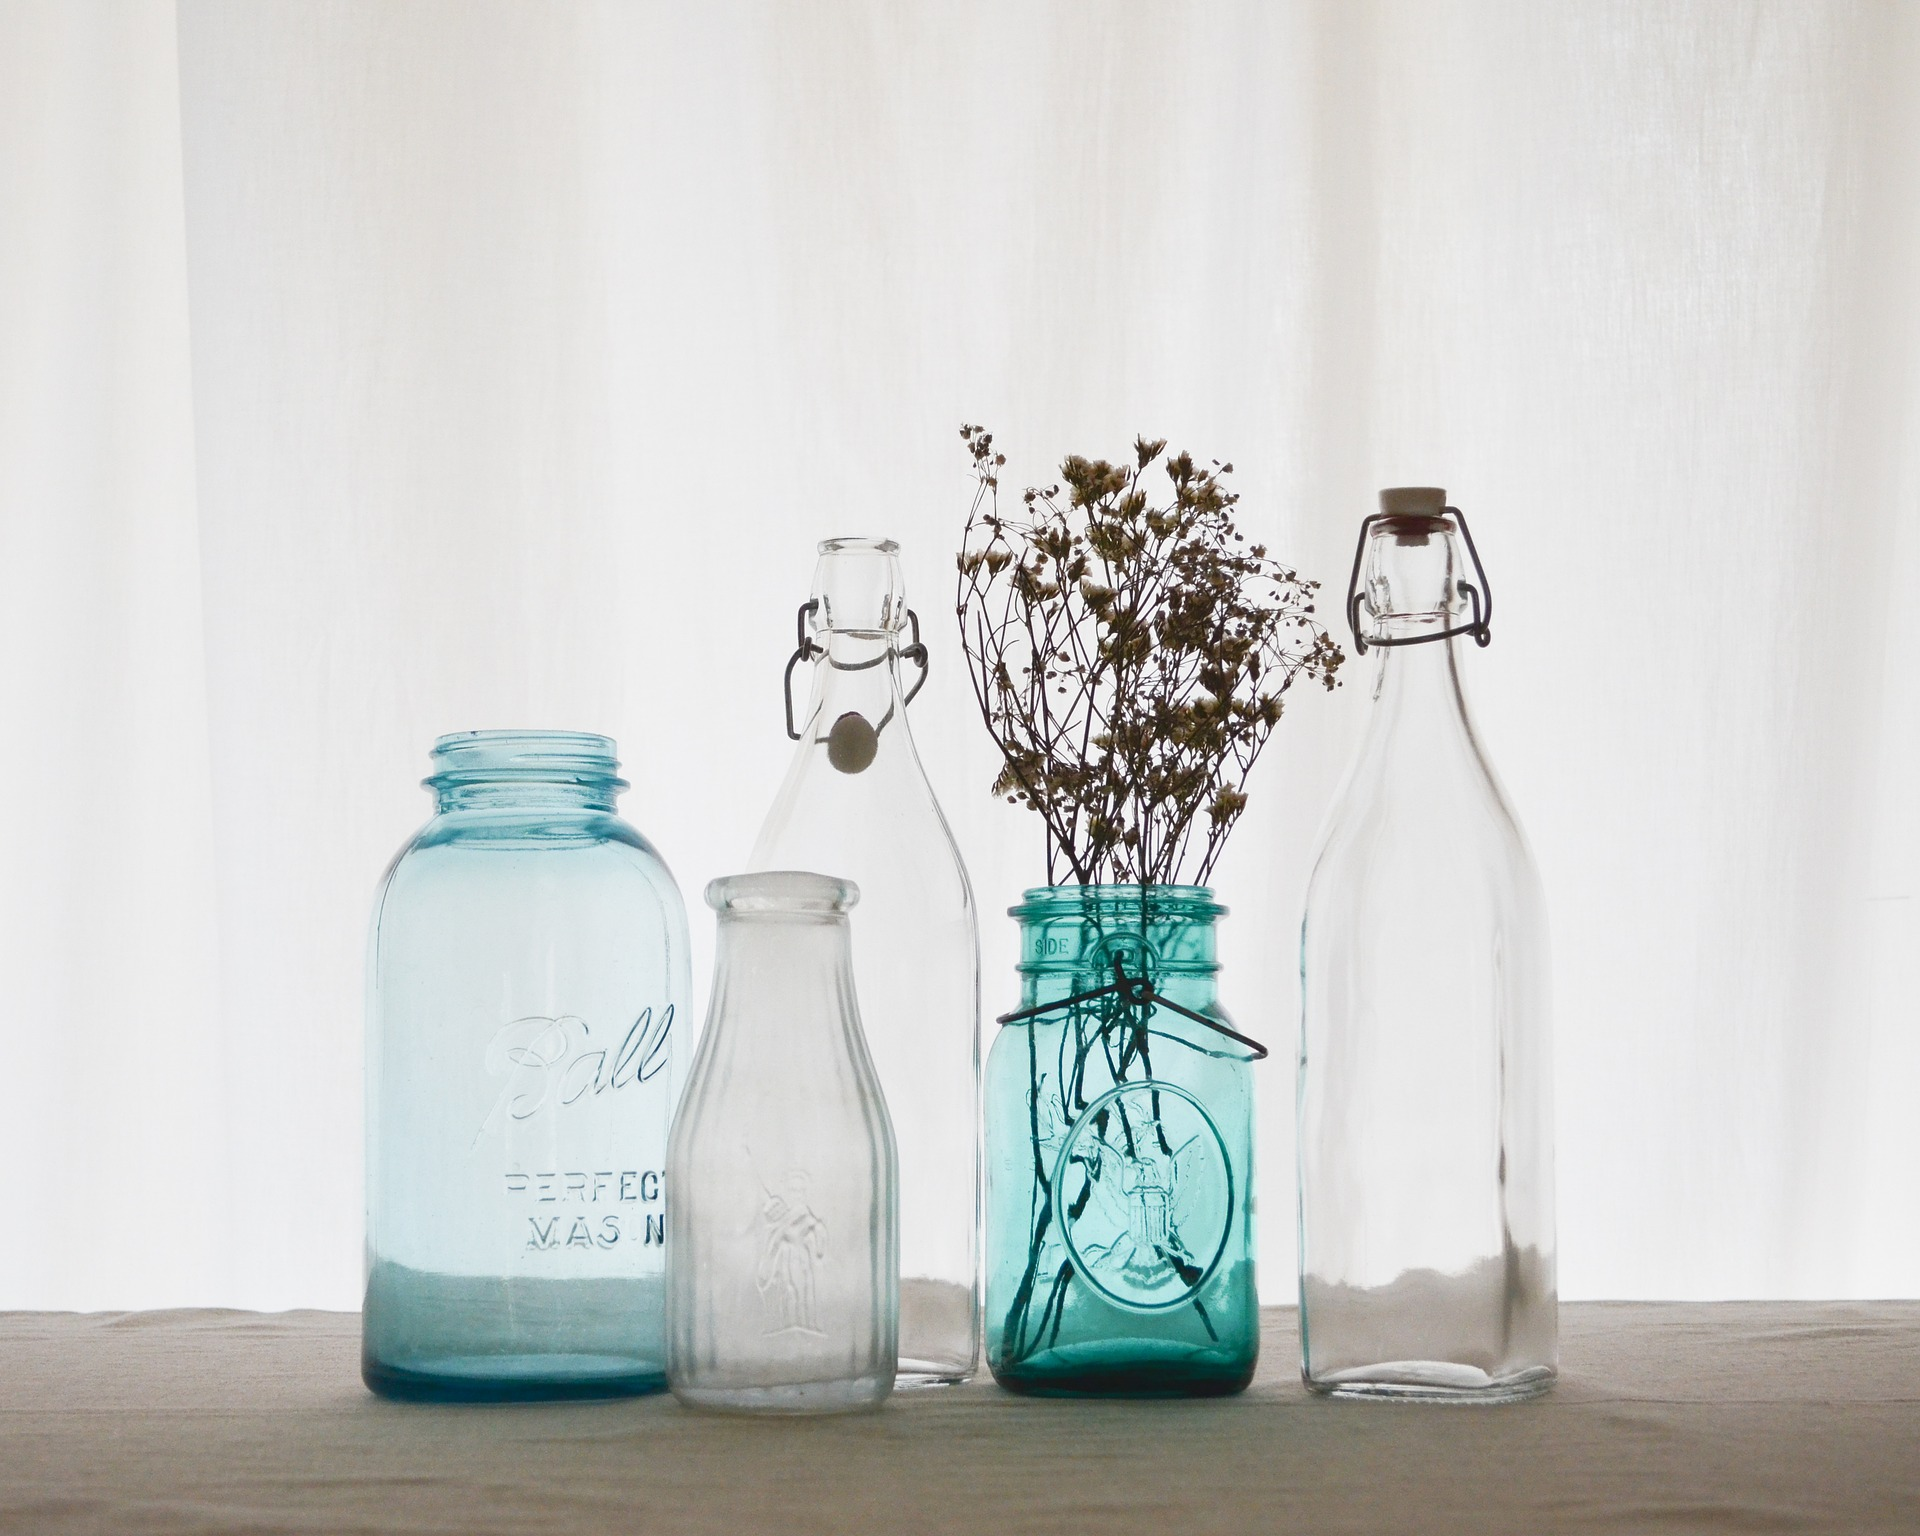 bottle-3061889_1920